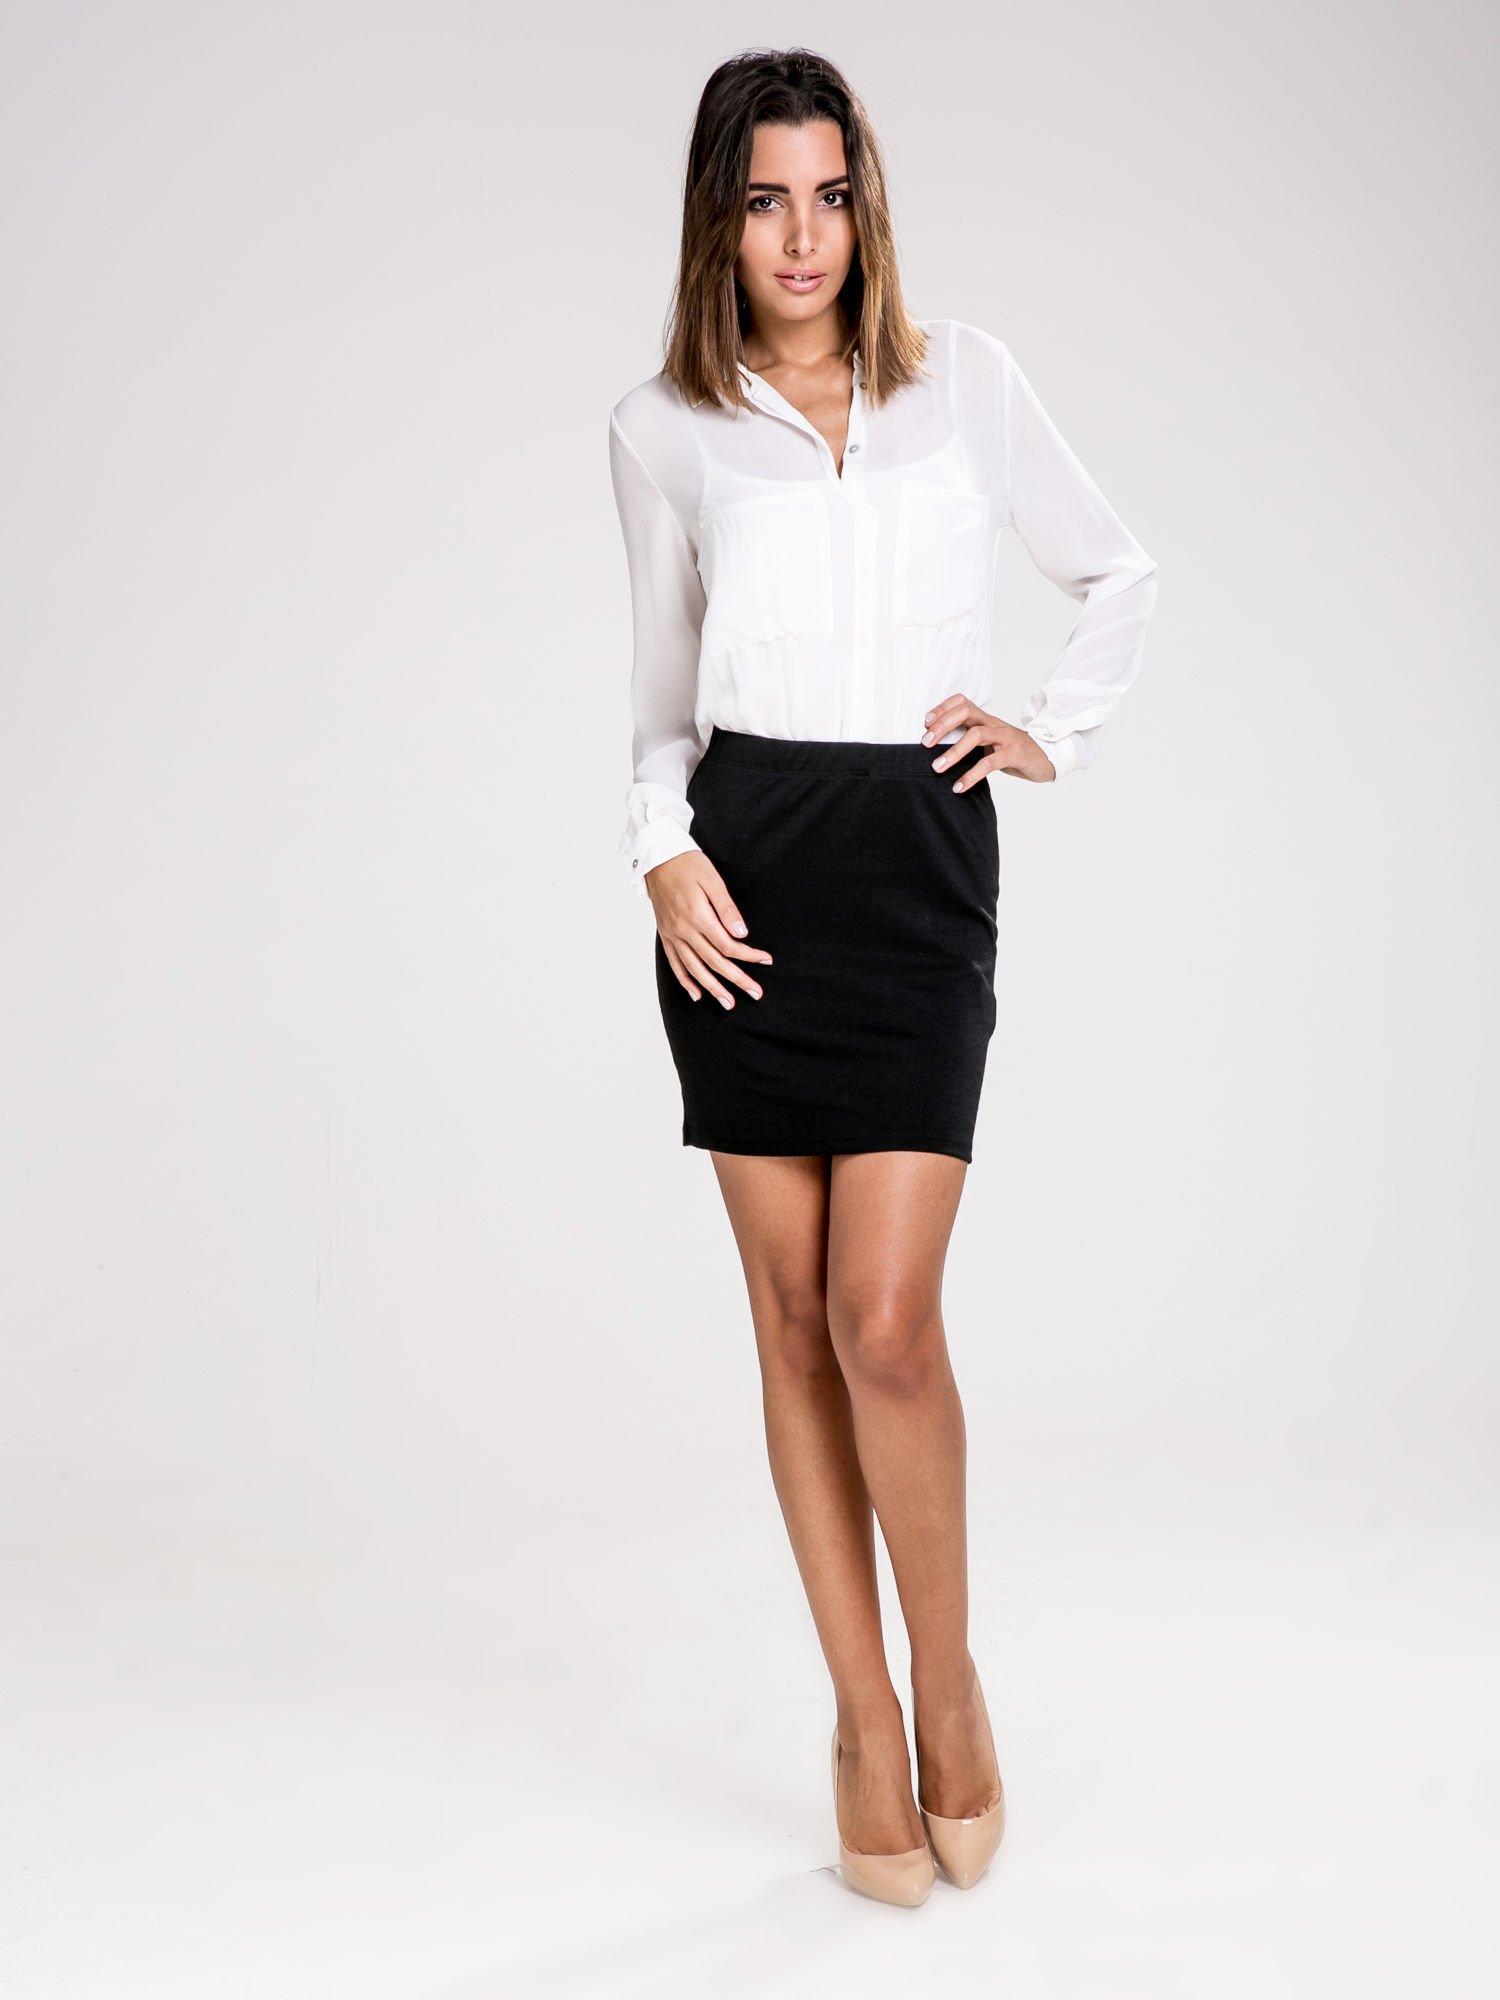 STRADIVARIUS Sukienka dwuczęściowa typu koszula + spódnica                                  zdj.                                  1